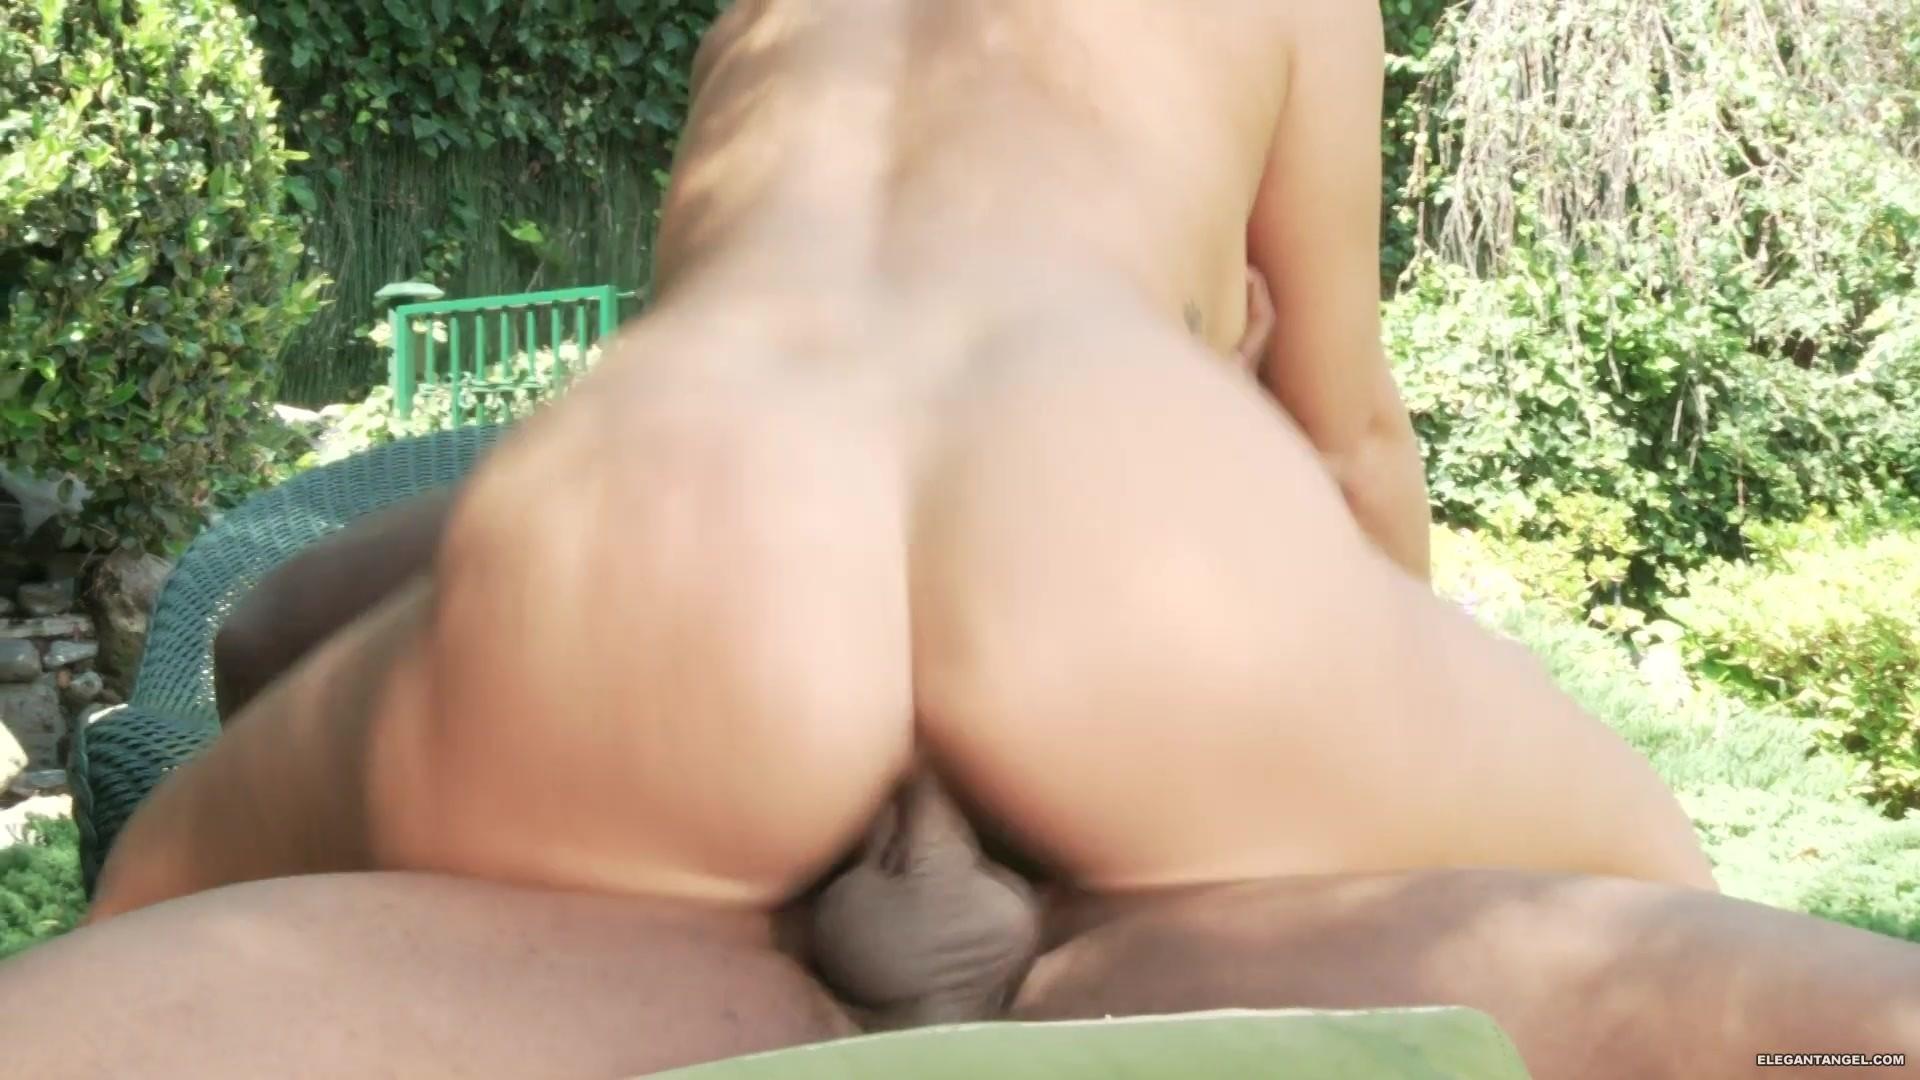 can t orgazm clitoral stimulation